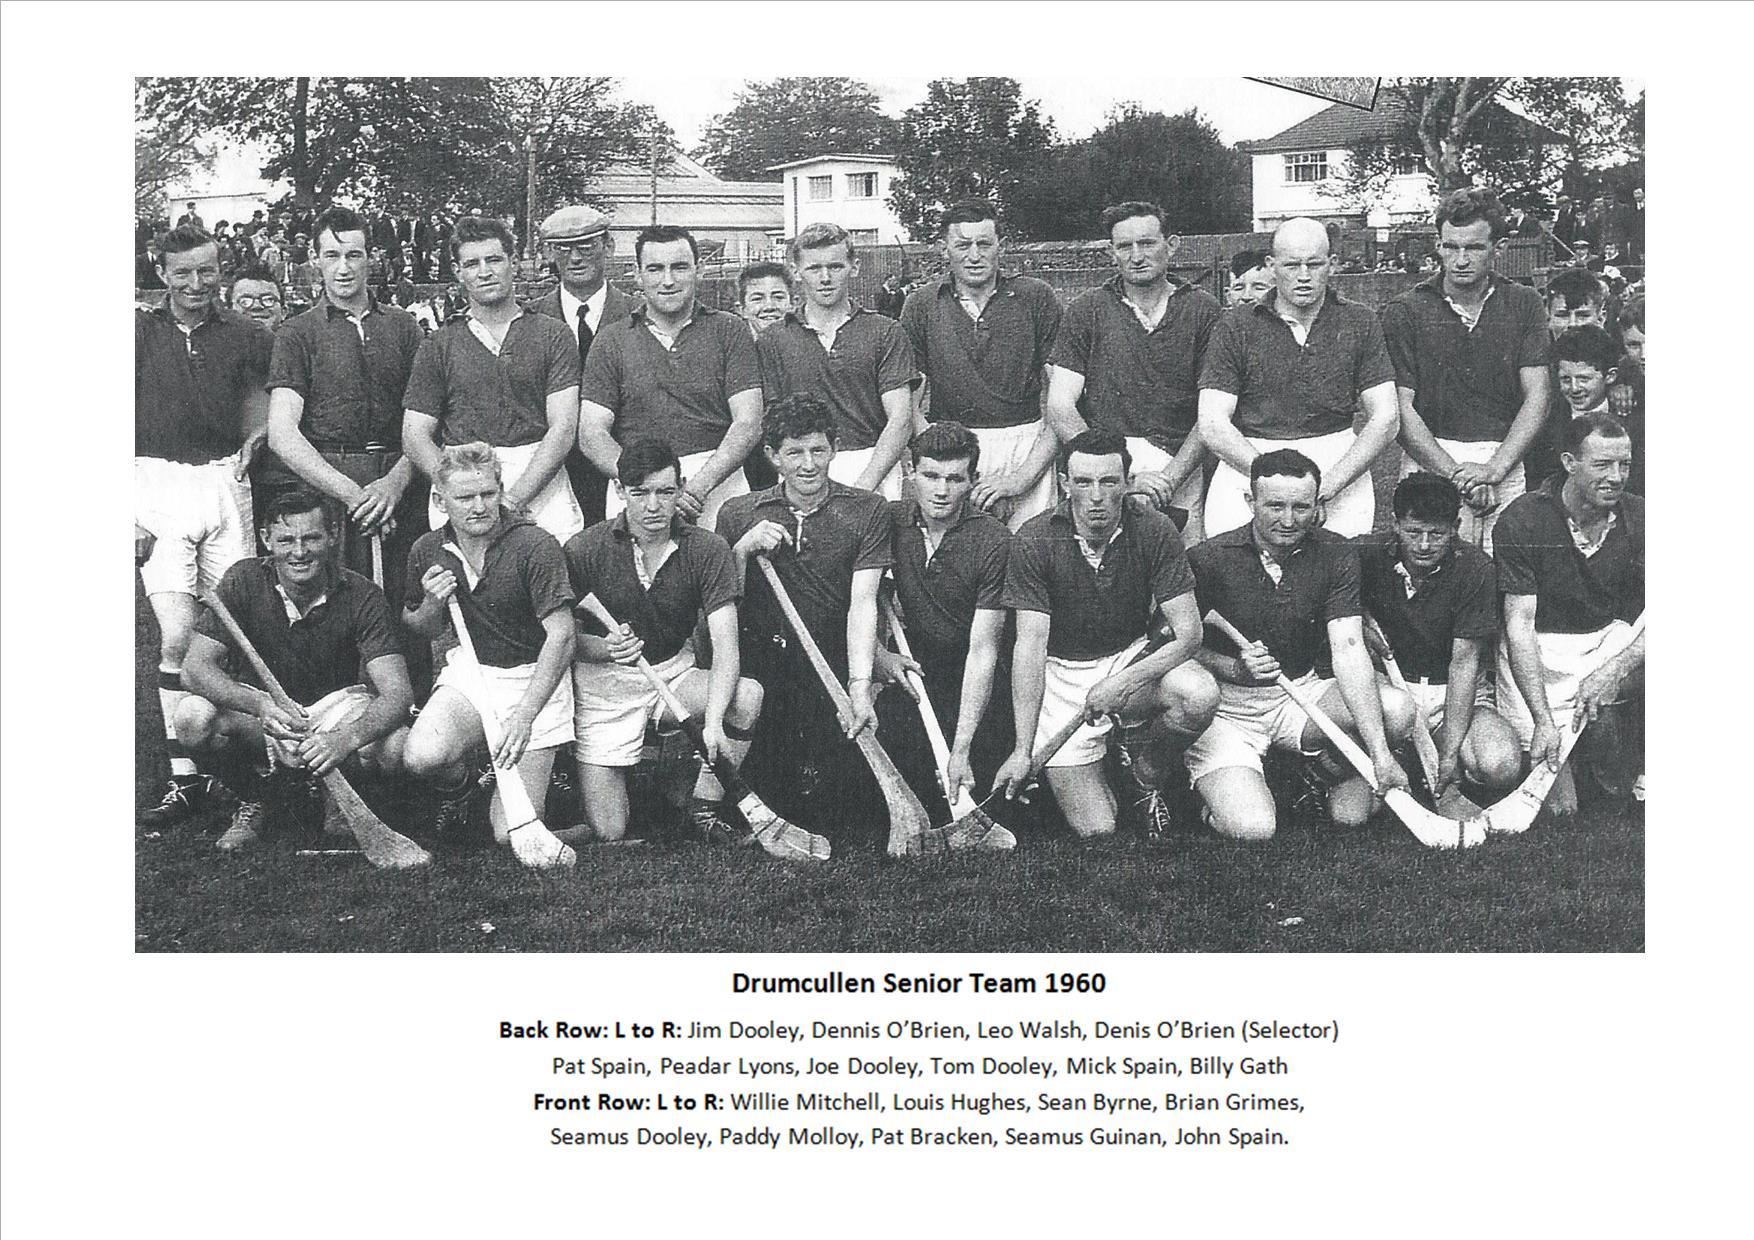 Drumcullen Senior Team - 1960